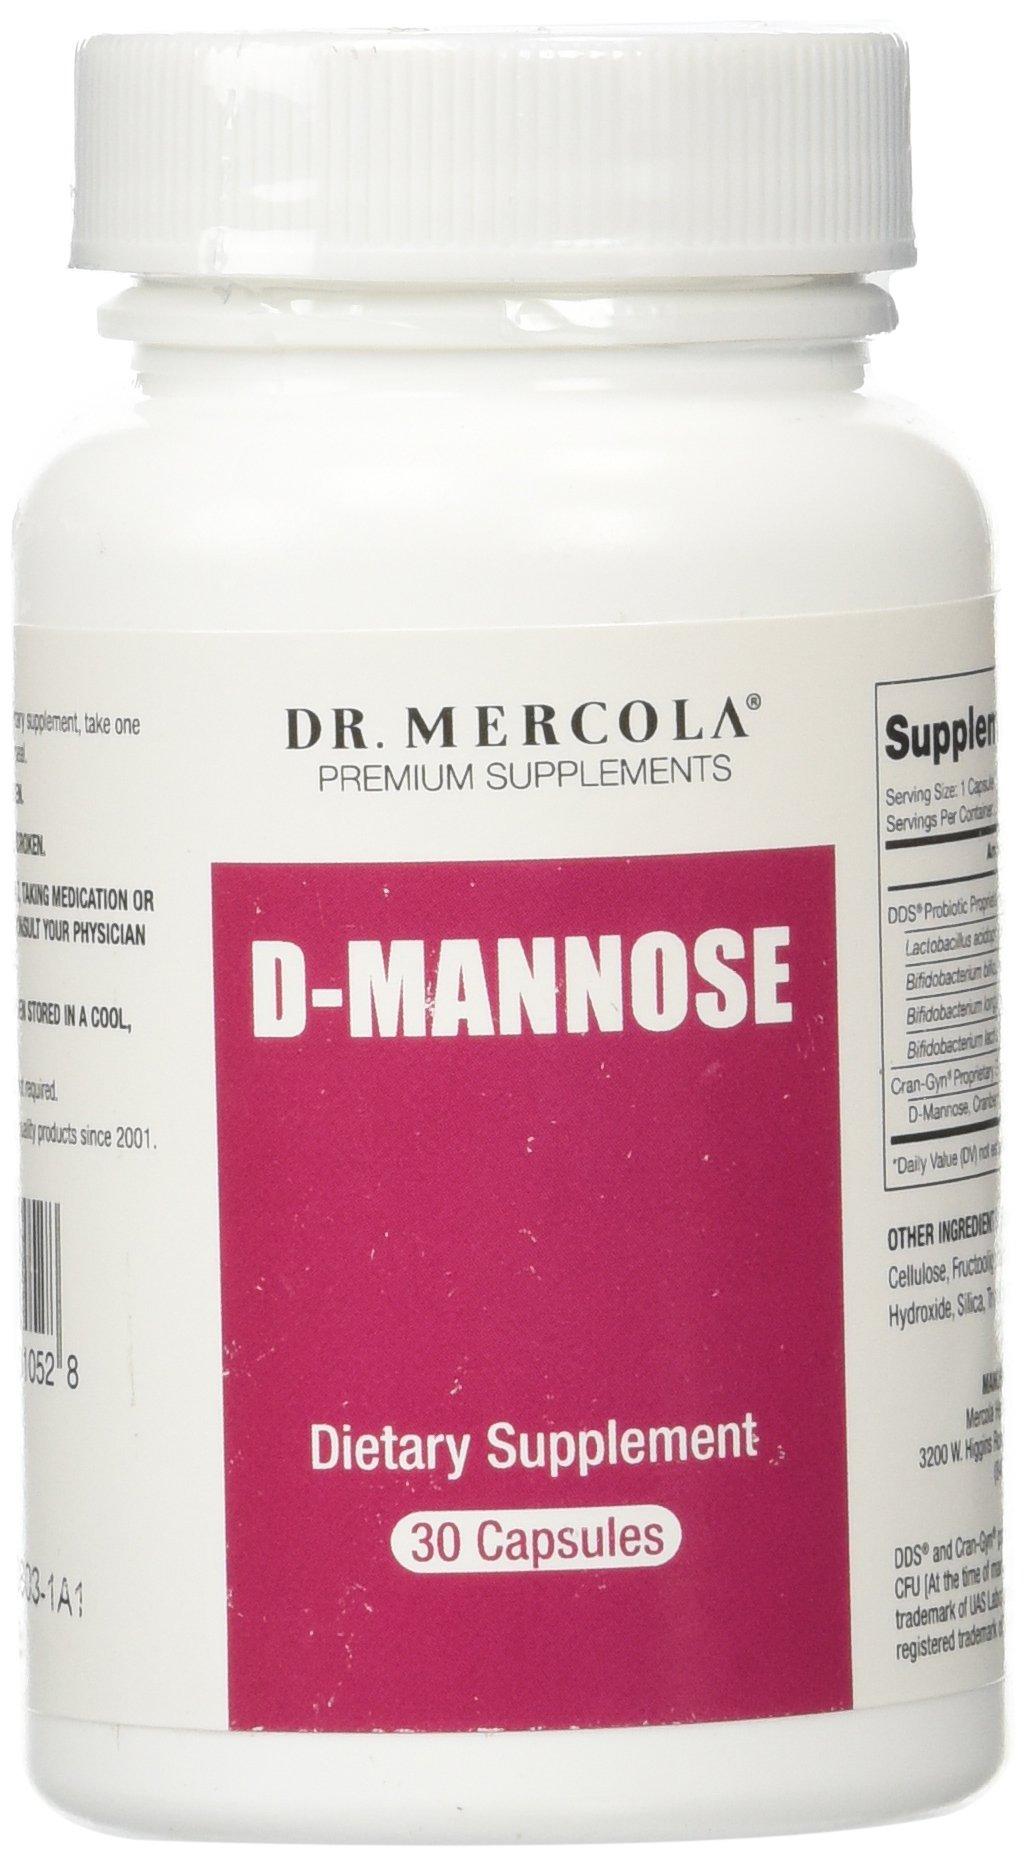 Dr Mercola D-Mannose - 30 Capsules - DDS Probiotic Proprietary Blend - Cran-Gyn Proprietary Bland - Premium Dietary Supplement